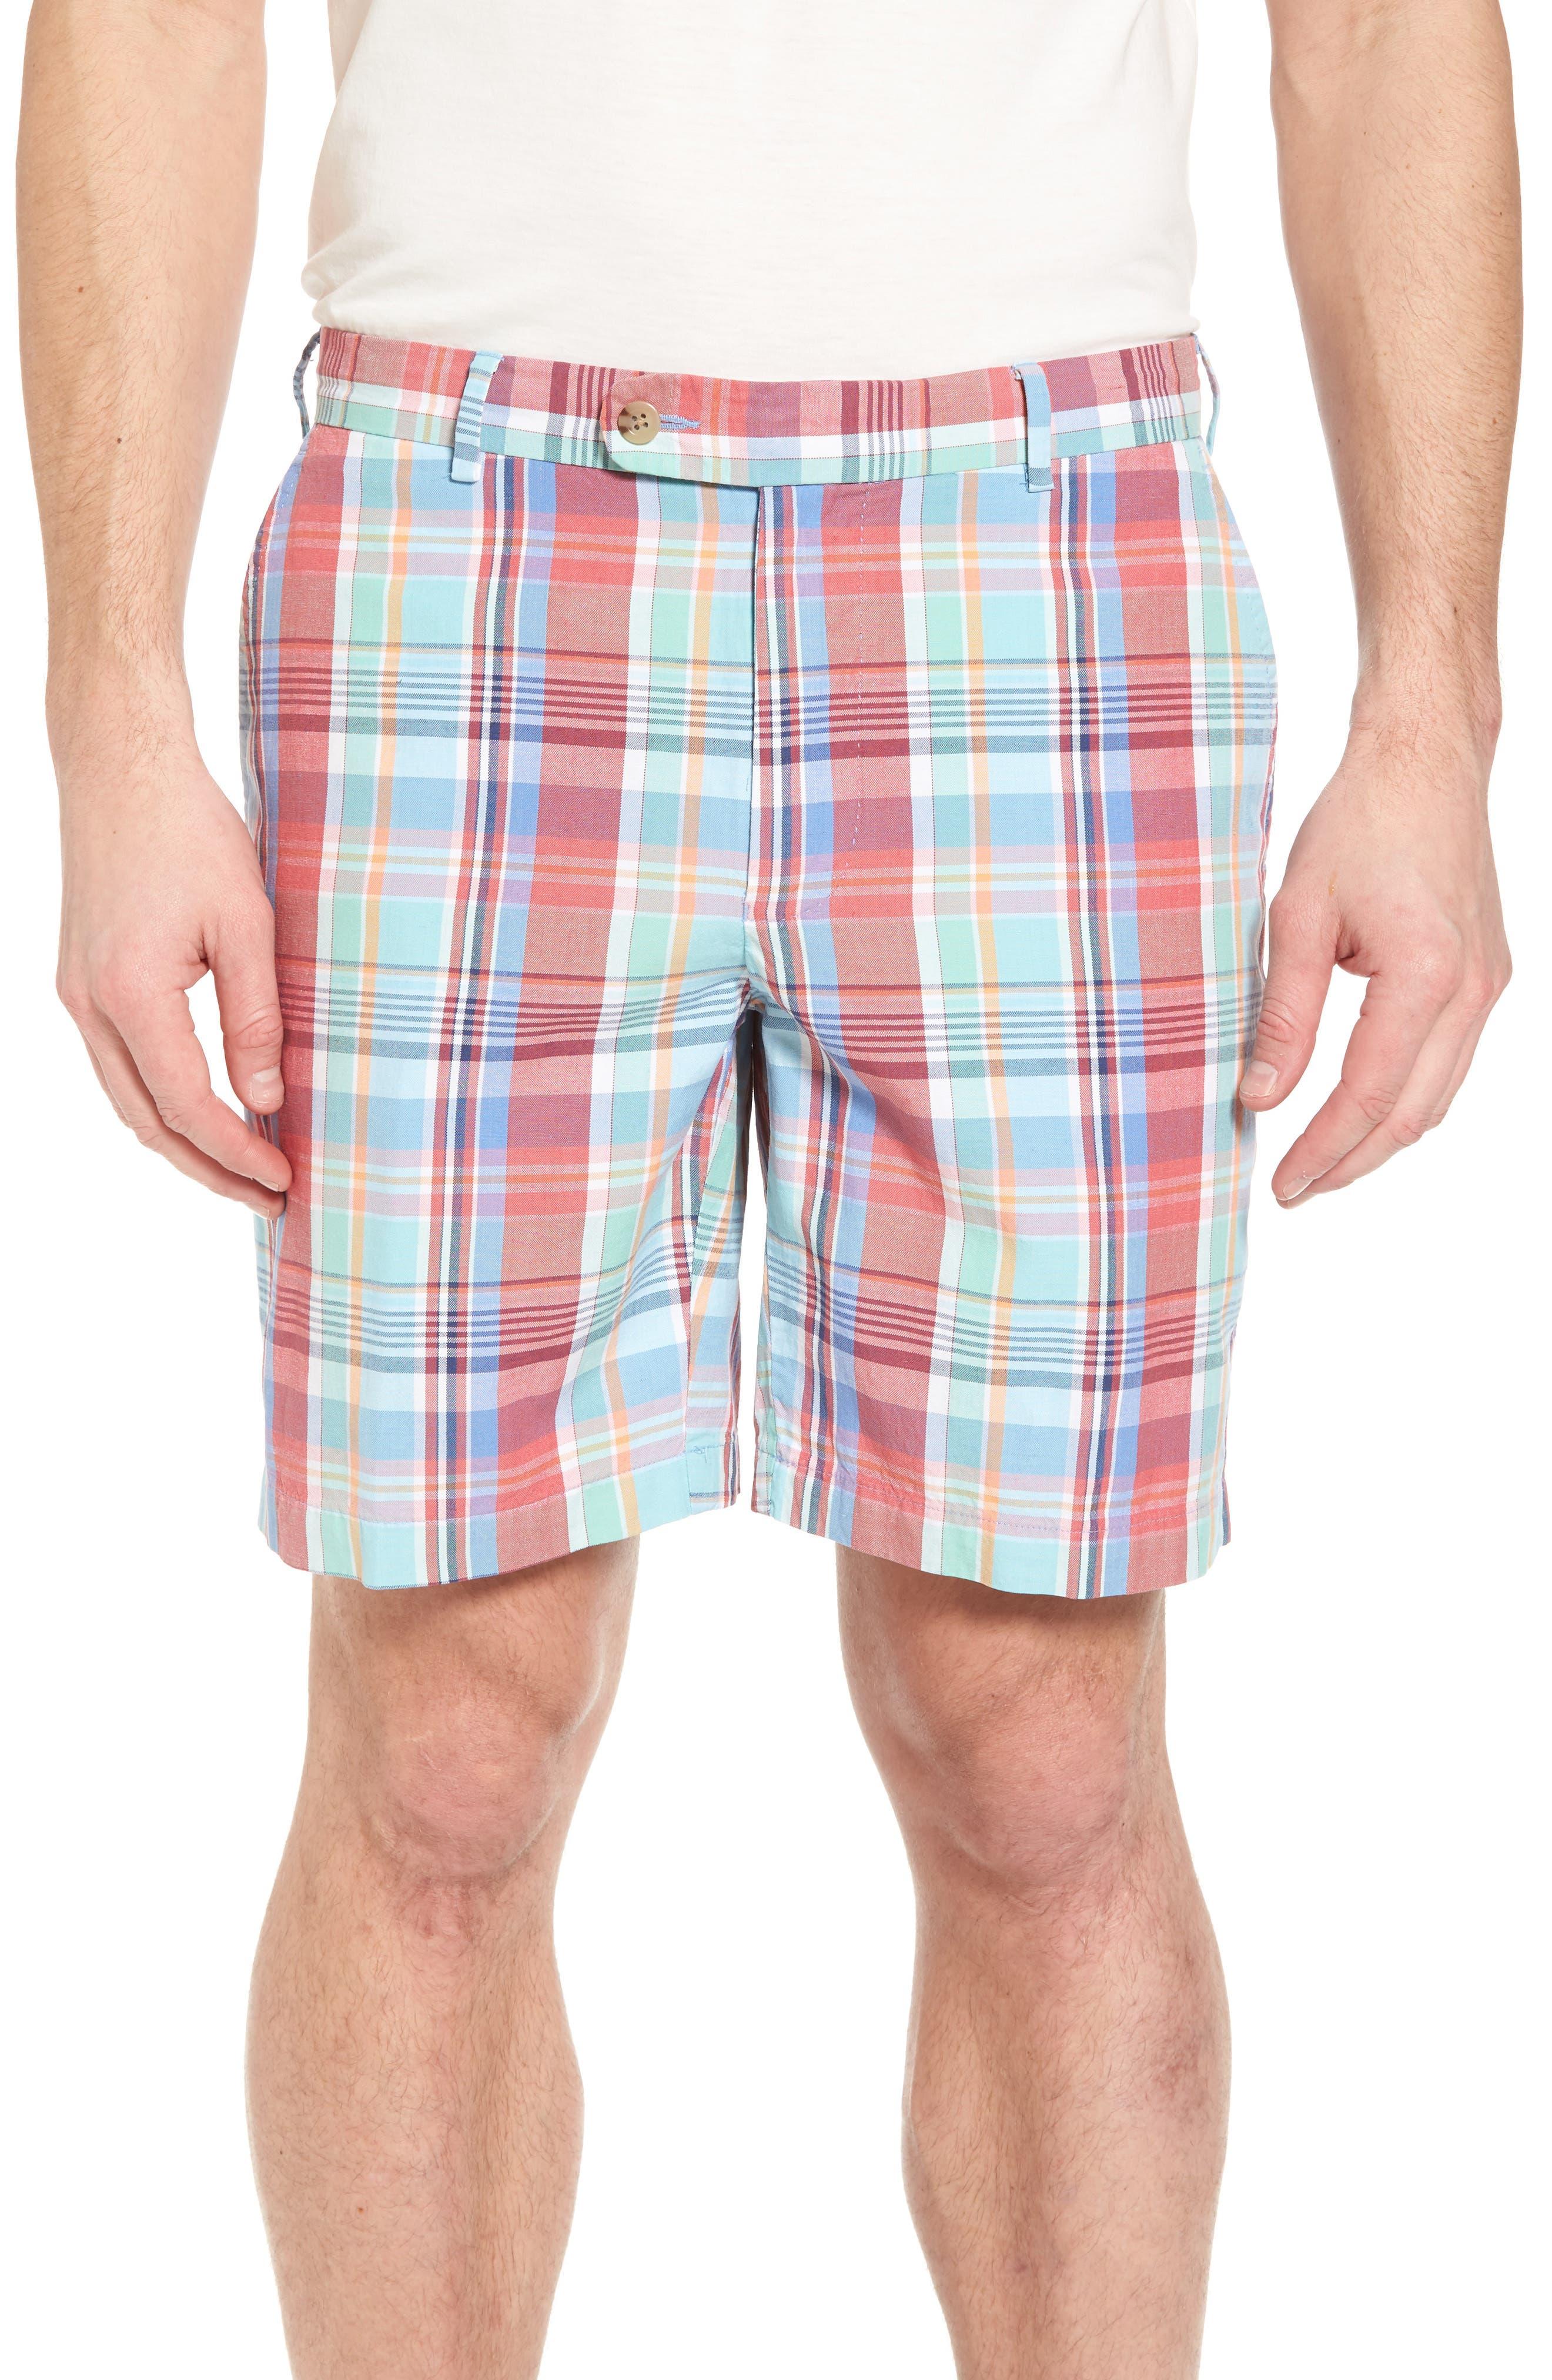 Seaside Madras Plaid Shorts,                             Main thumbnail 1, color,                             600